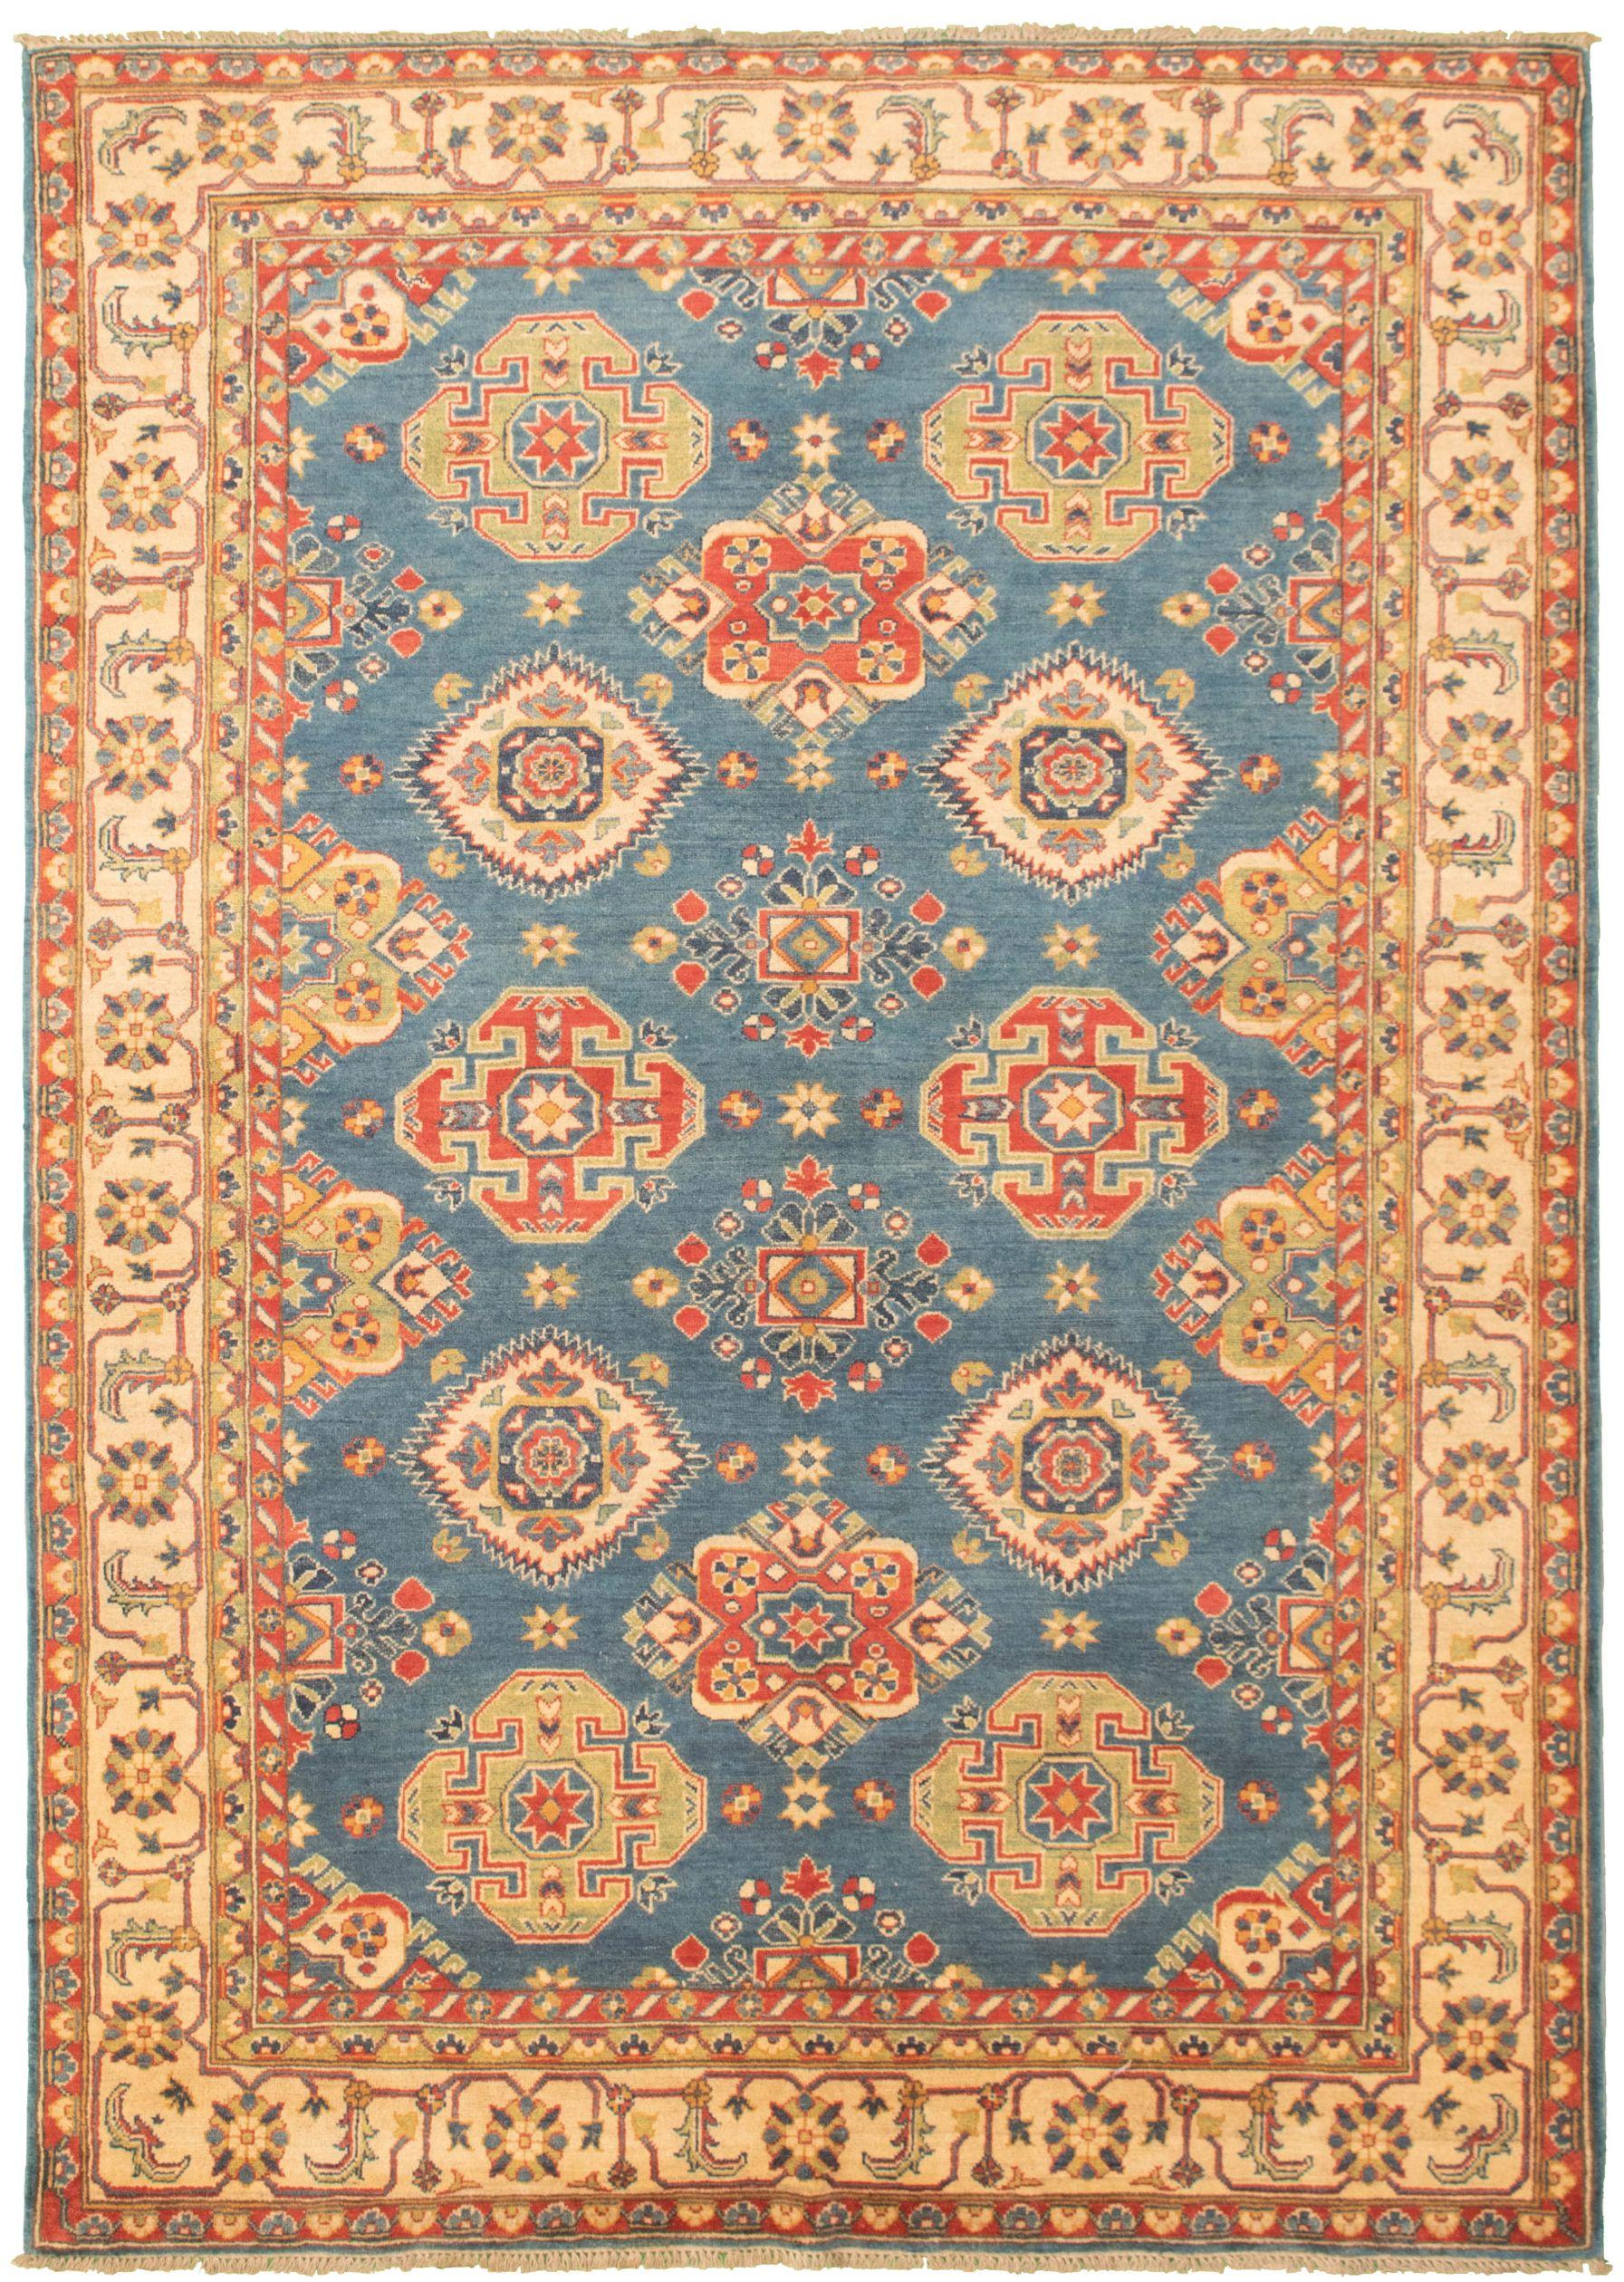 "Hand-knotted Finest Gazni Light Denim Blue Wool Rug 6'5"" x 9'7"" Size: 6'5"" x 9'7"""